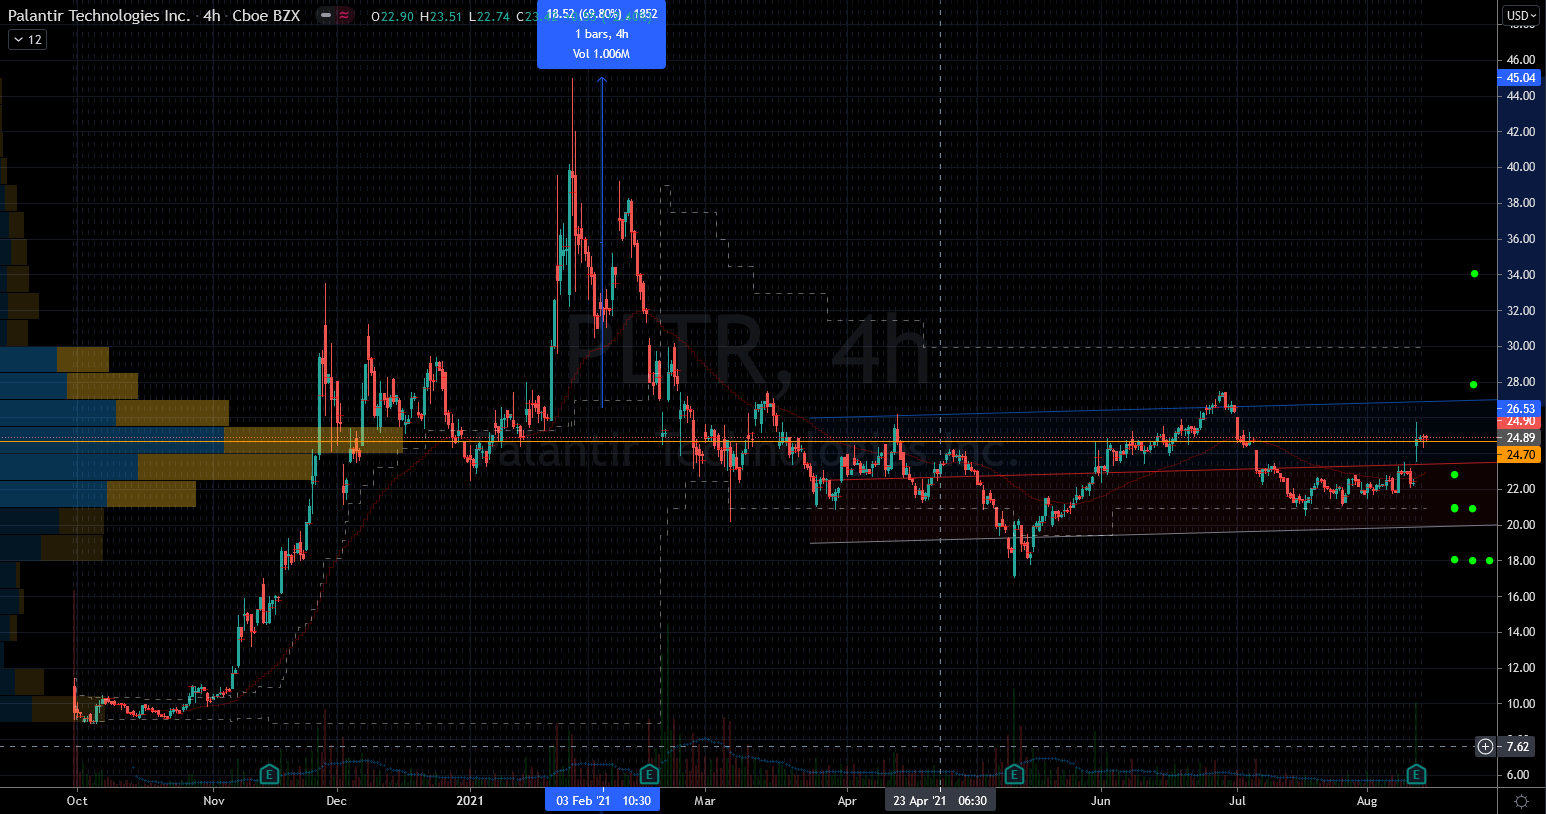 Palantir (PLTR) Stock Chart Showing Lifetime Range